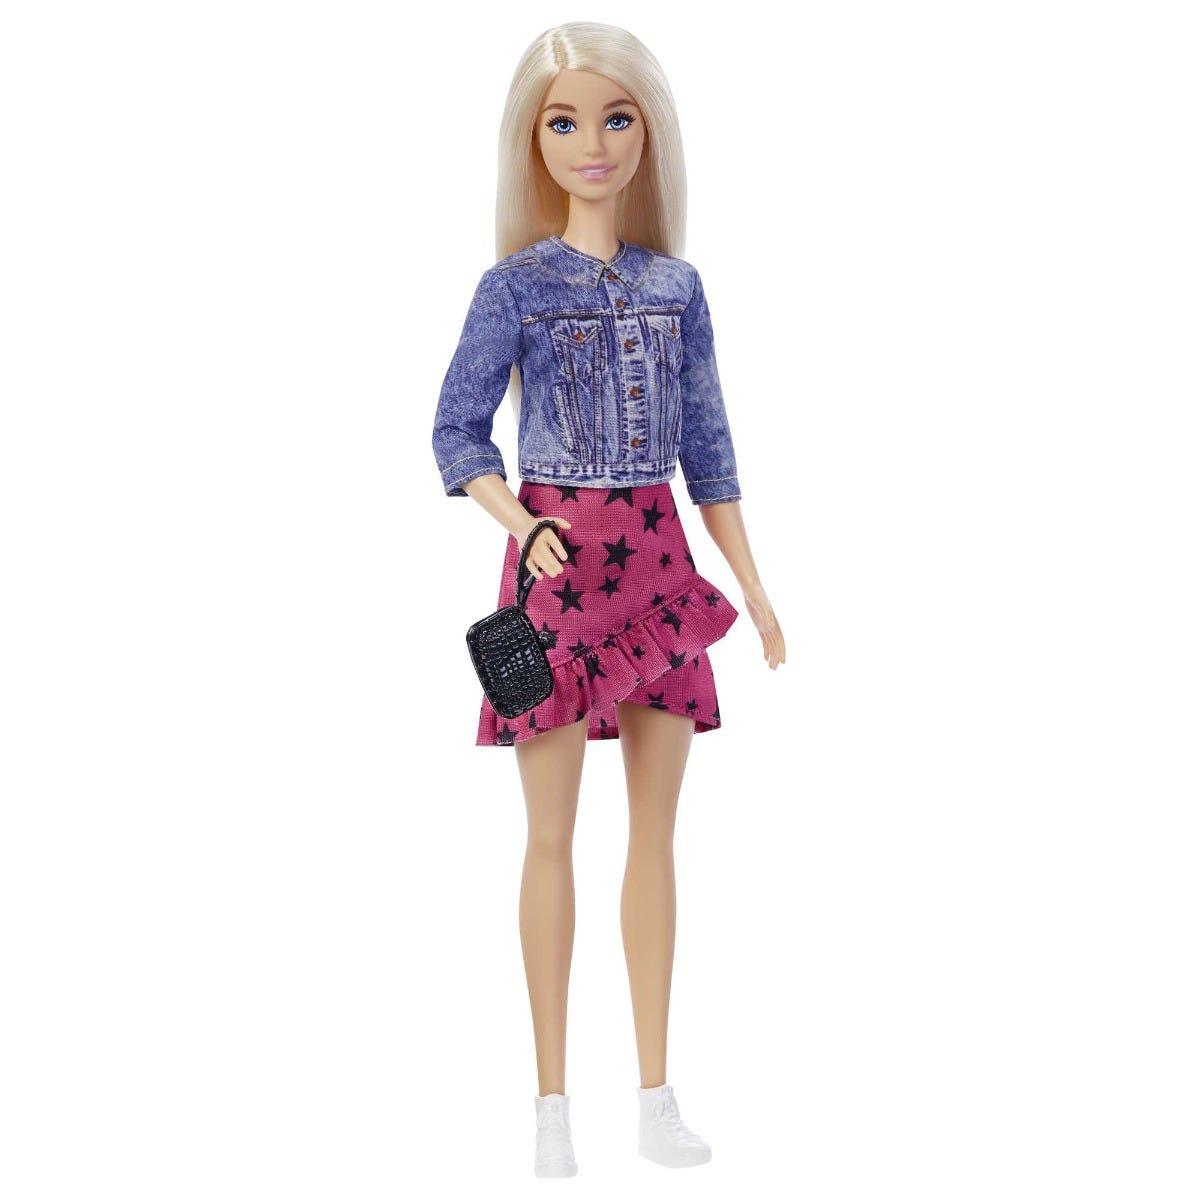 Barbie Big City Dreams Malibu Core Doll